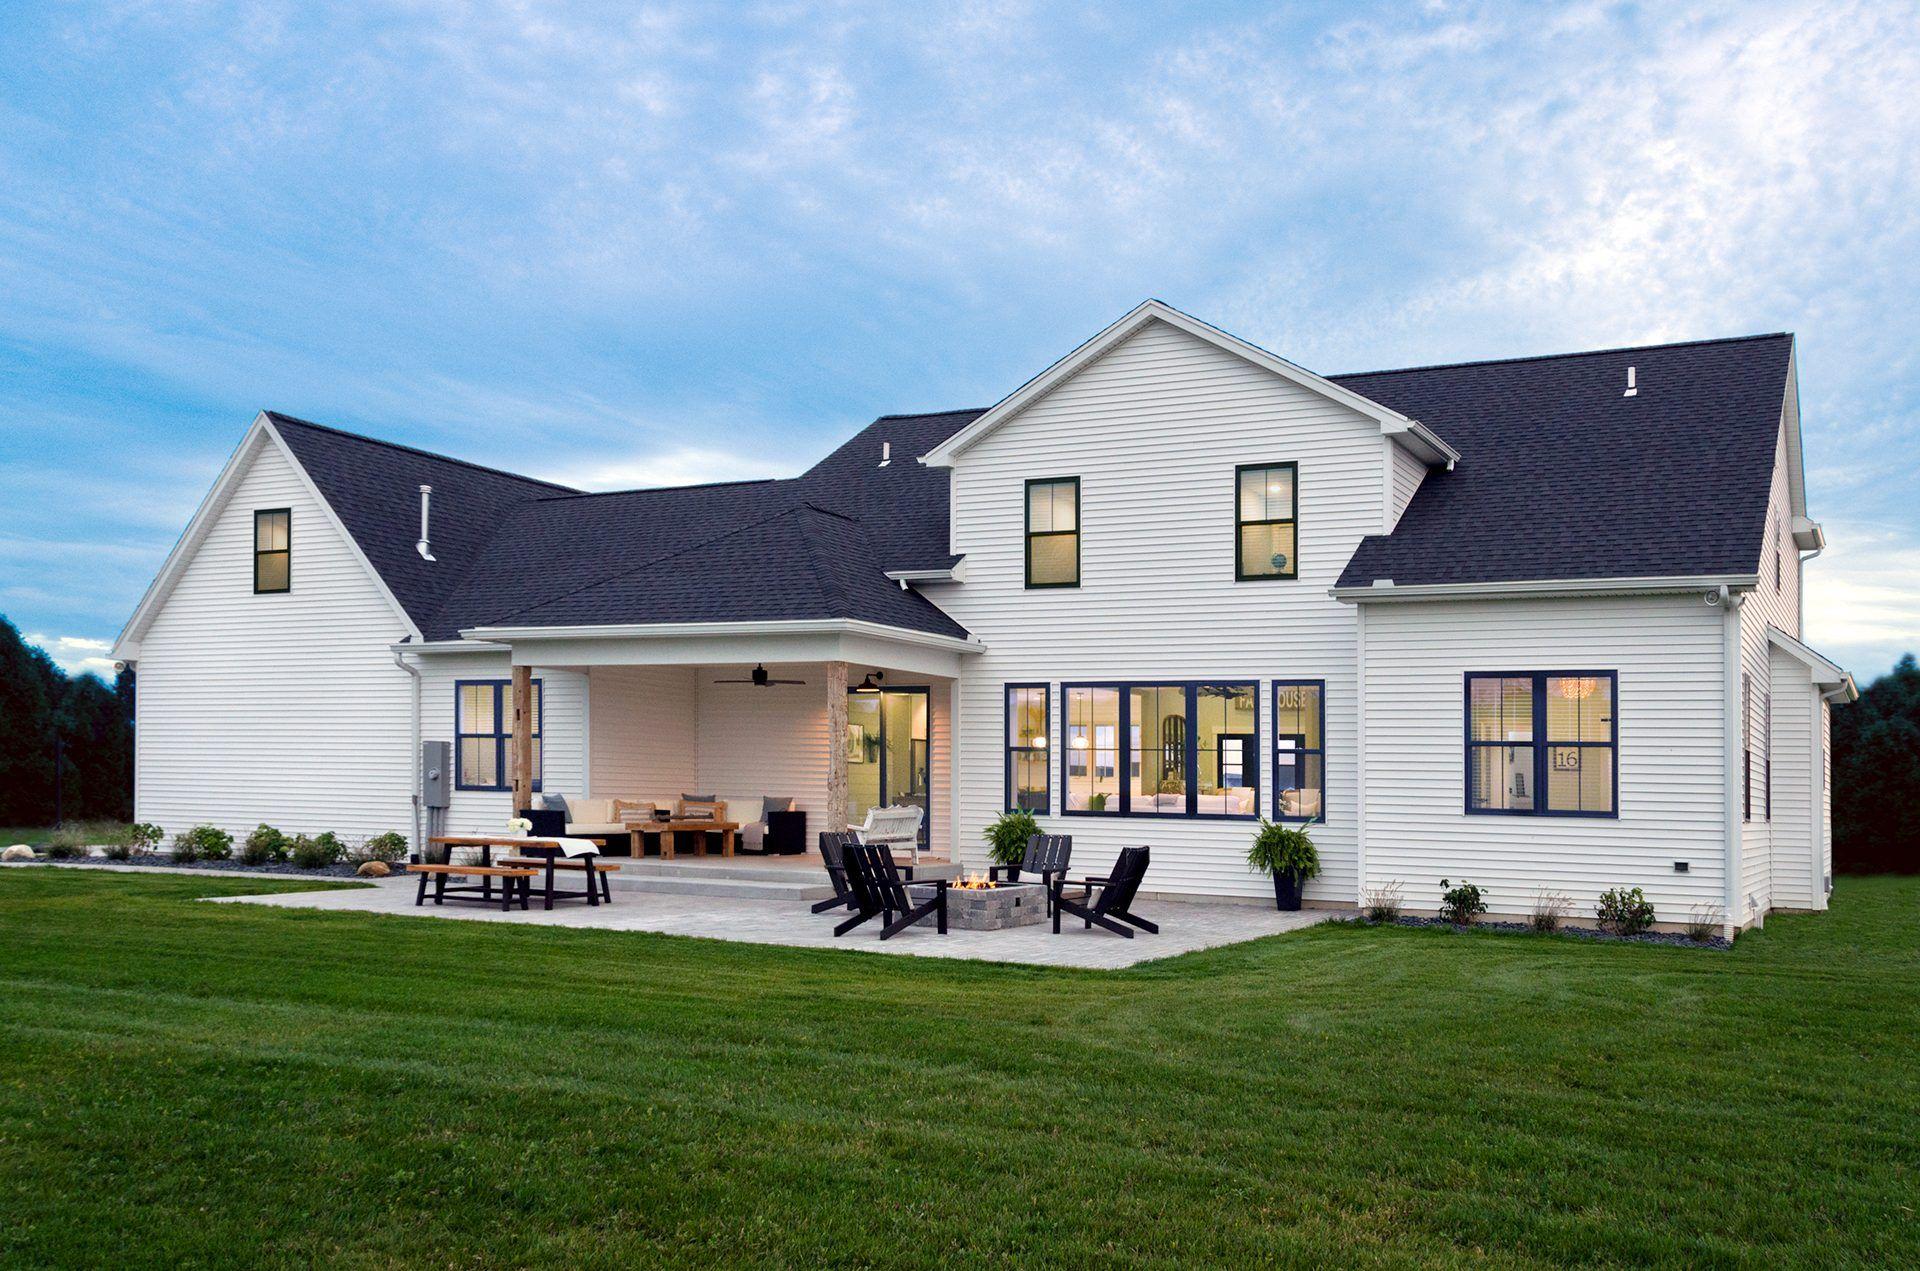 modern farmhouse vinyl siding institute vsi vinyl on modern house designs siding that look amazing id=16153